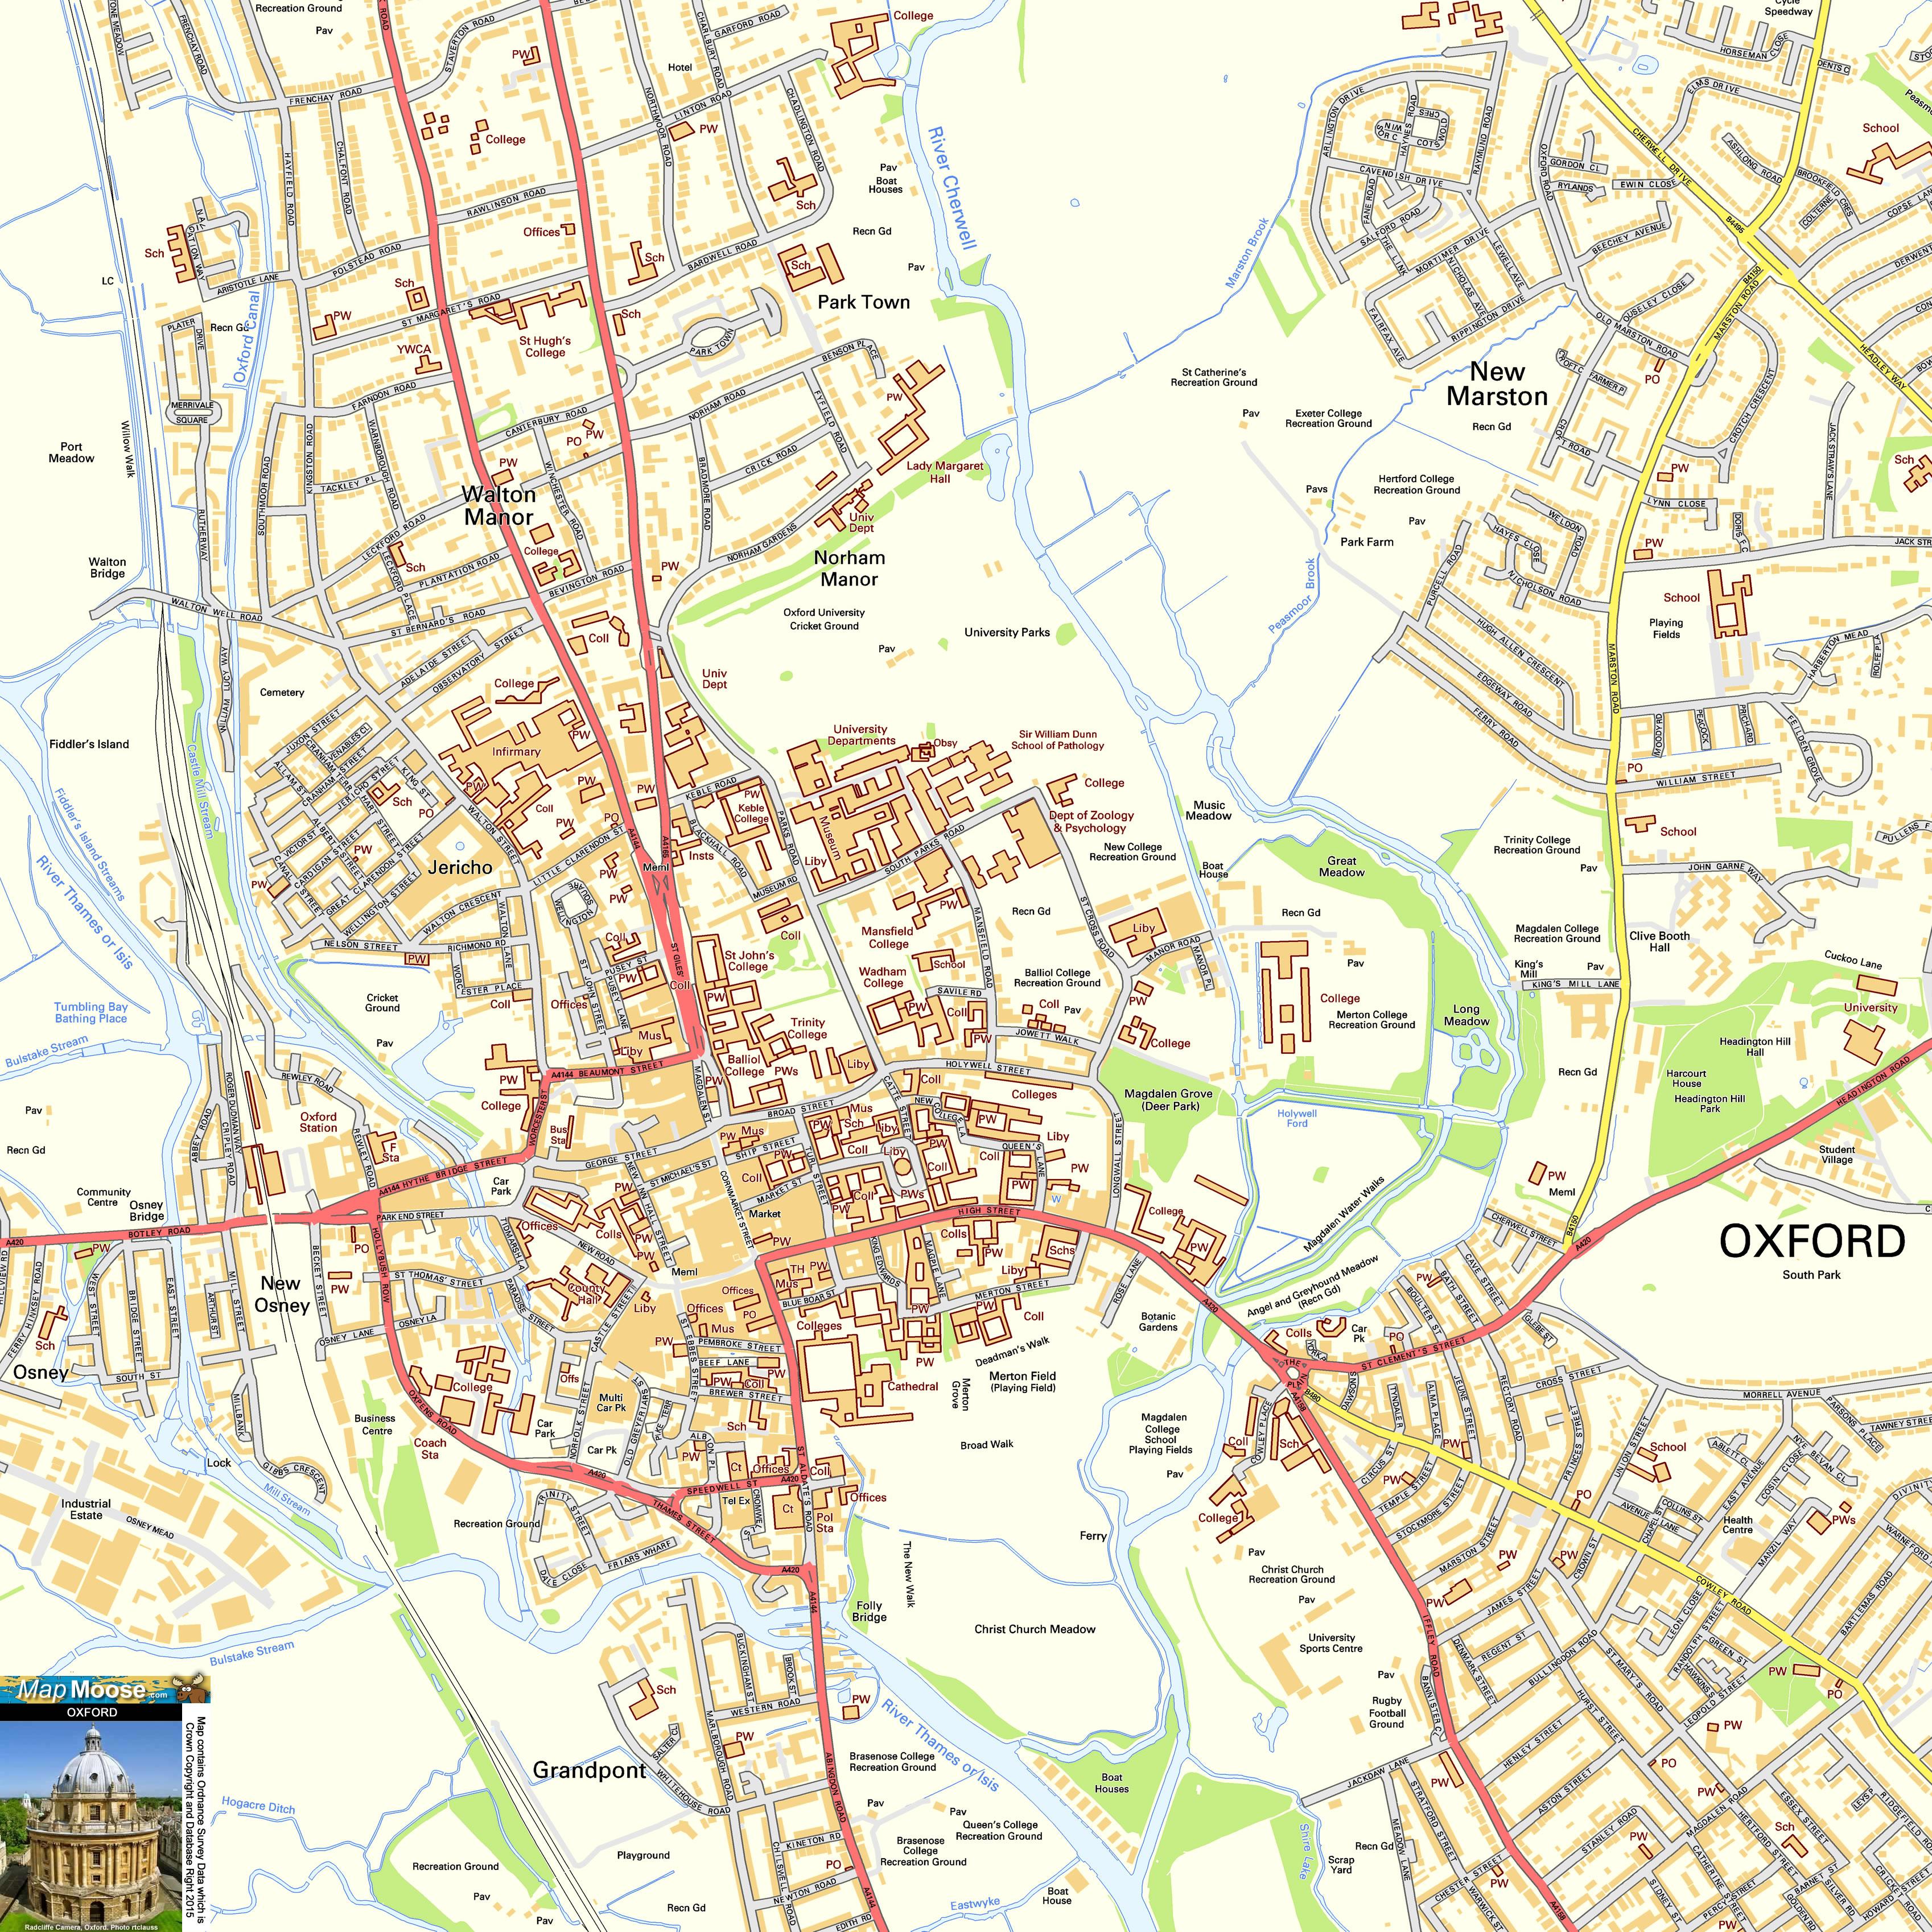 Oxford Offline Street Map including Oxford University River Thames